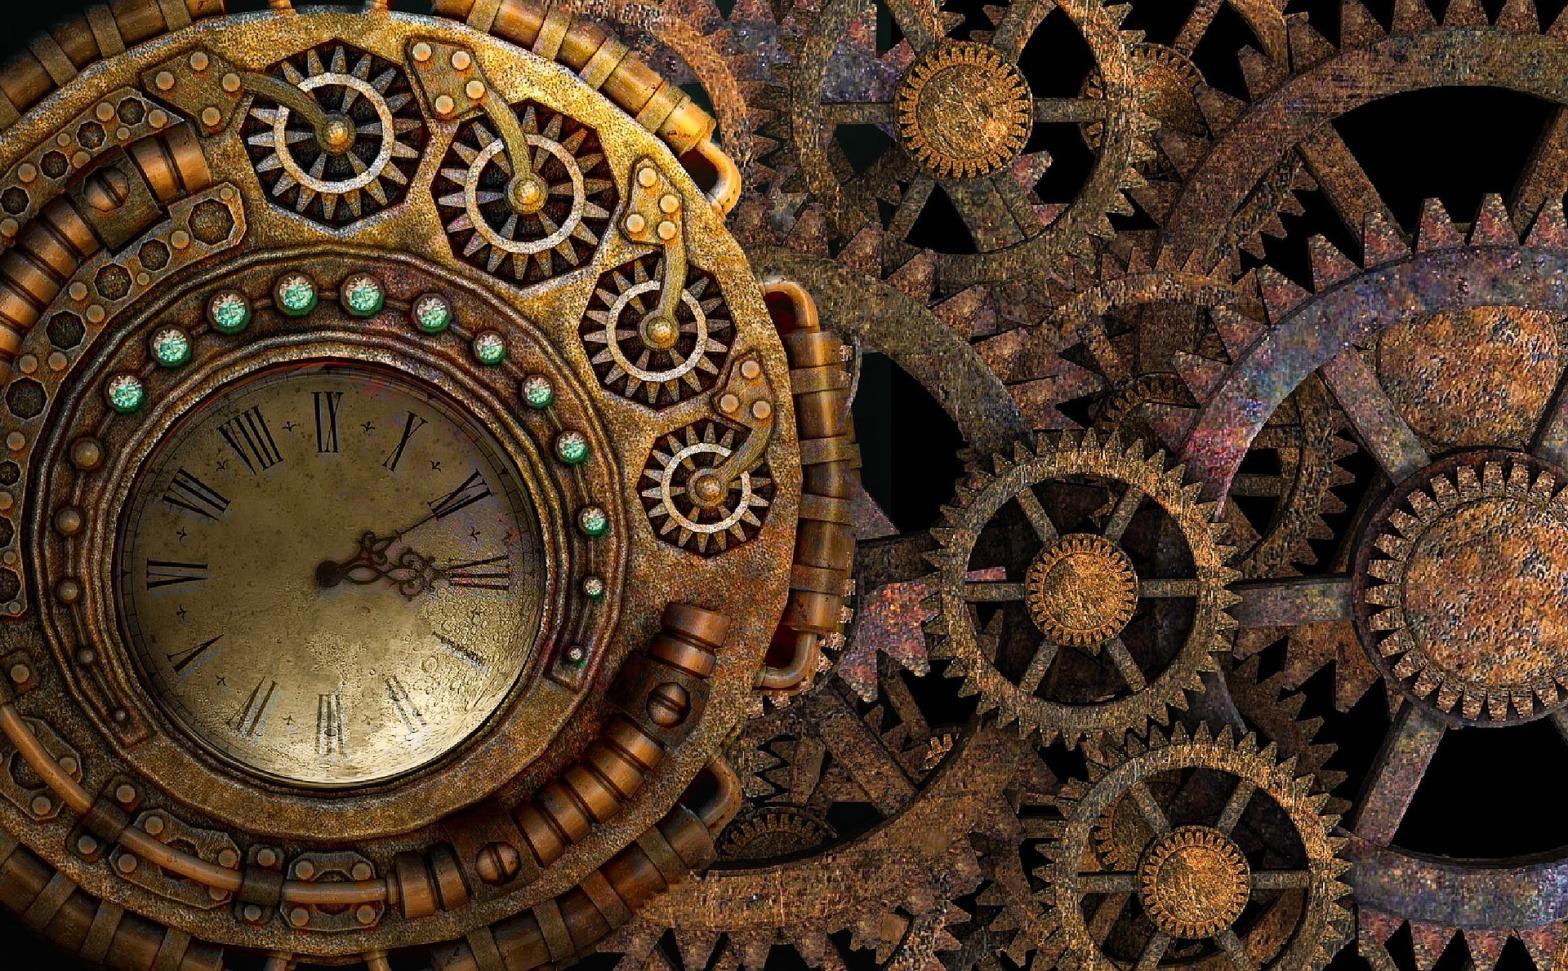 Steampunk clockwork and gears